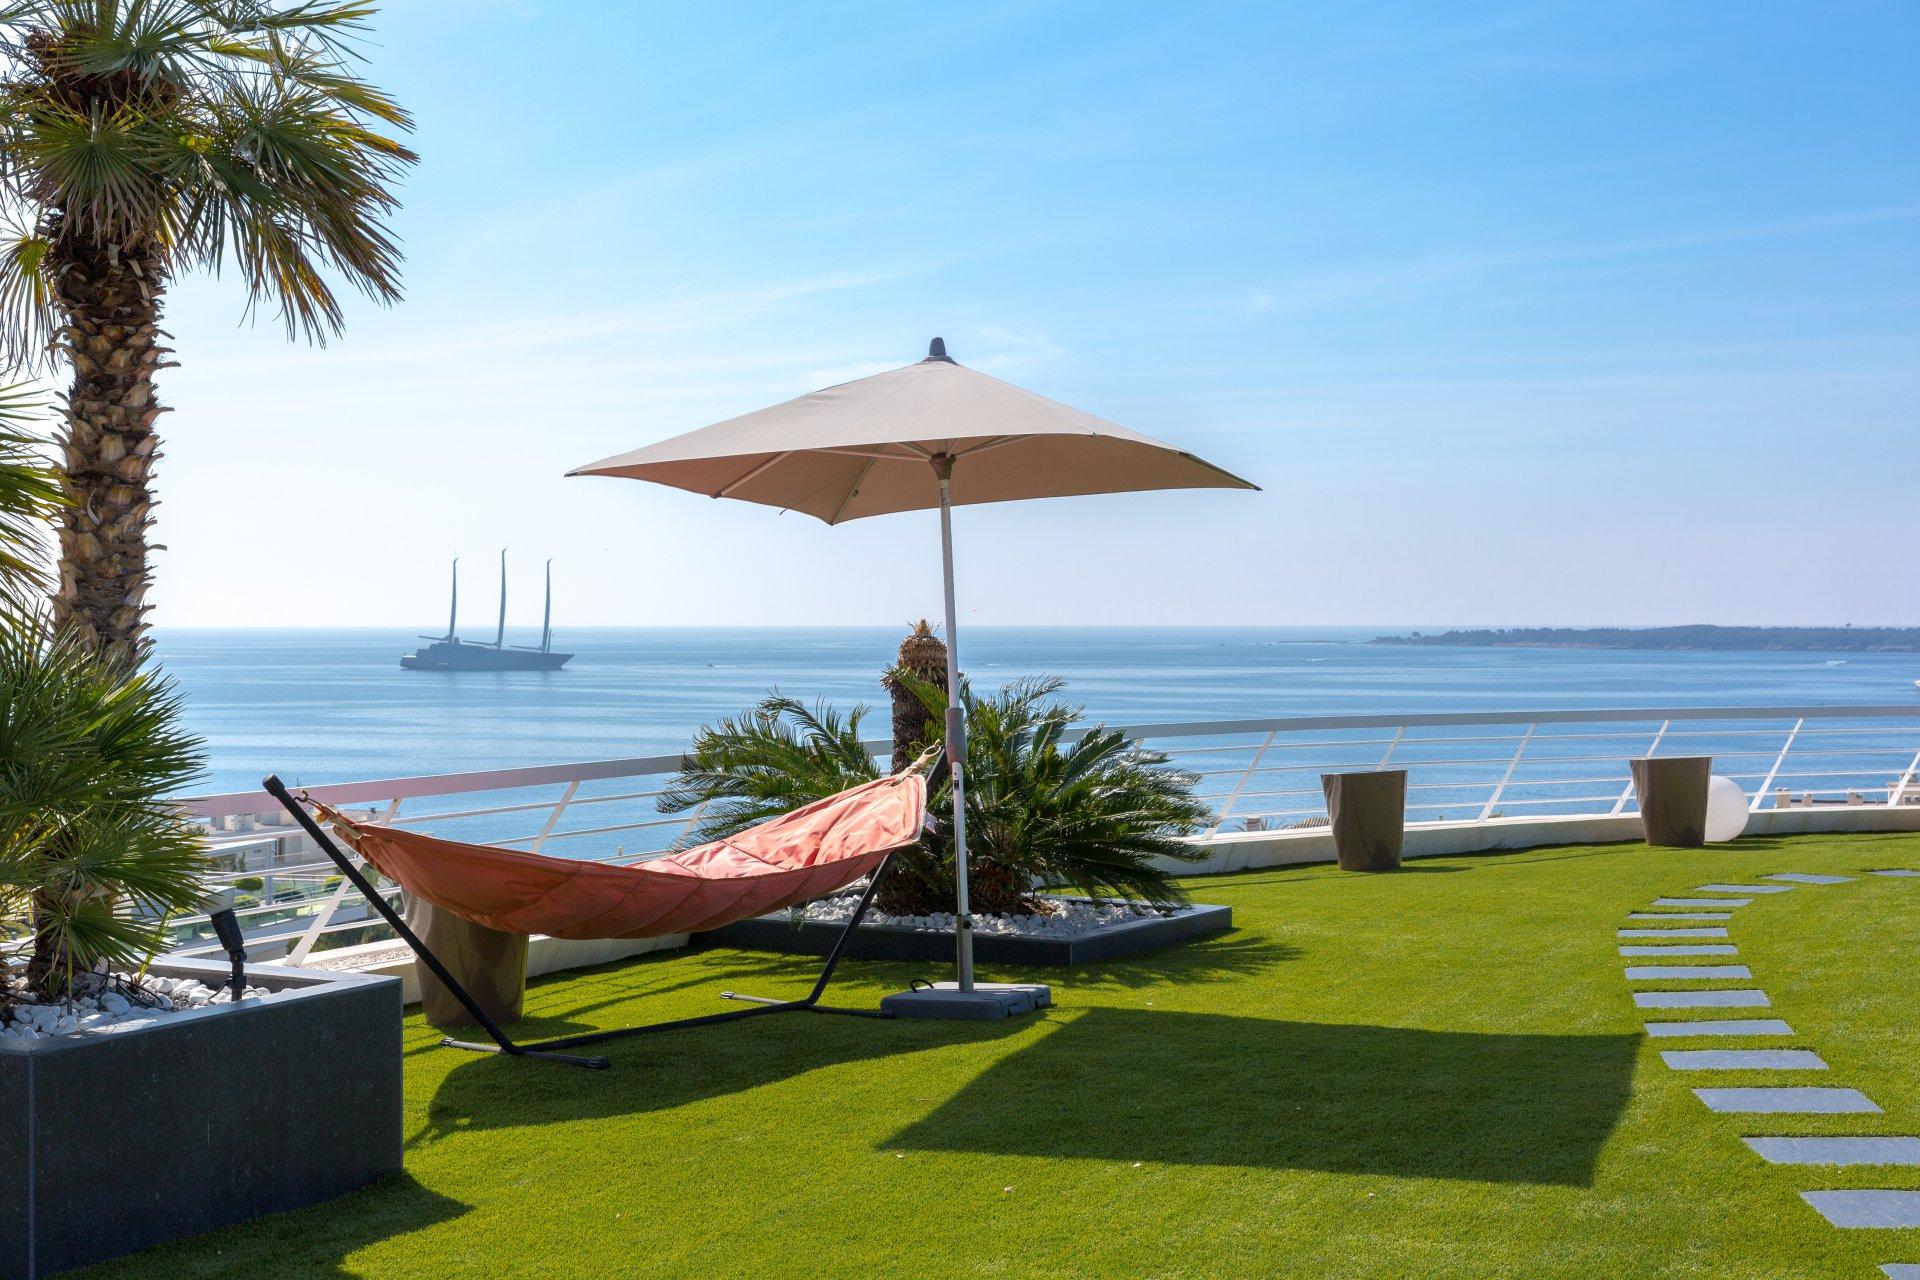 Annonce Vente Villa sur toit Cannes 06400 4 Pices refV4945CA